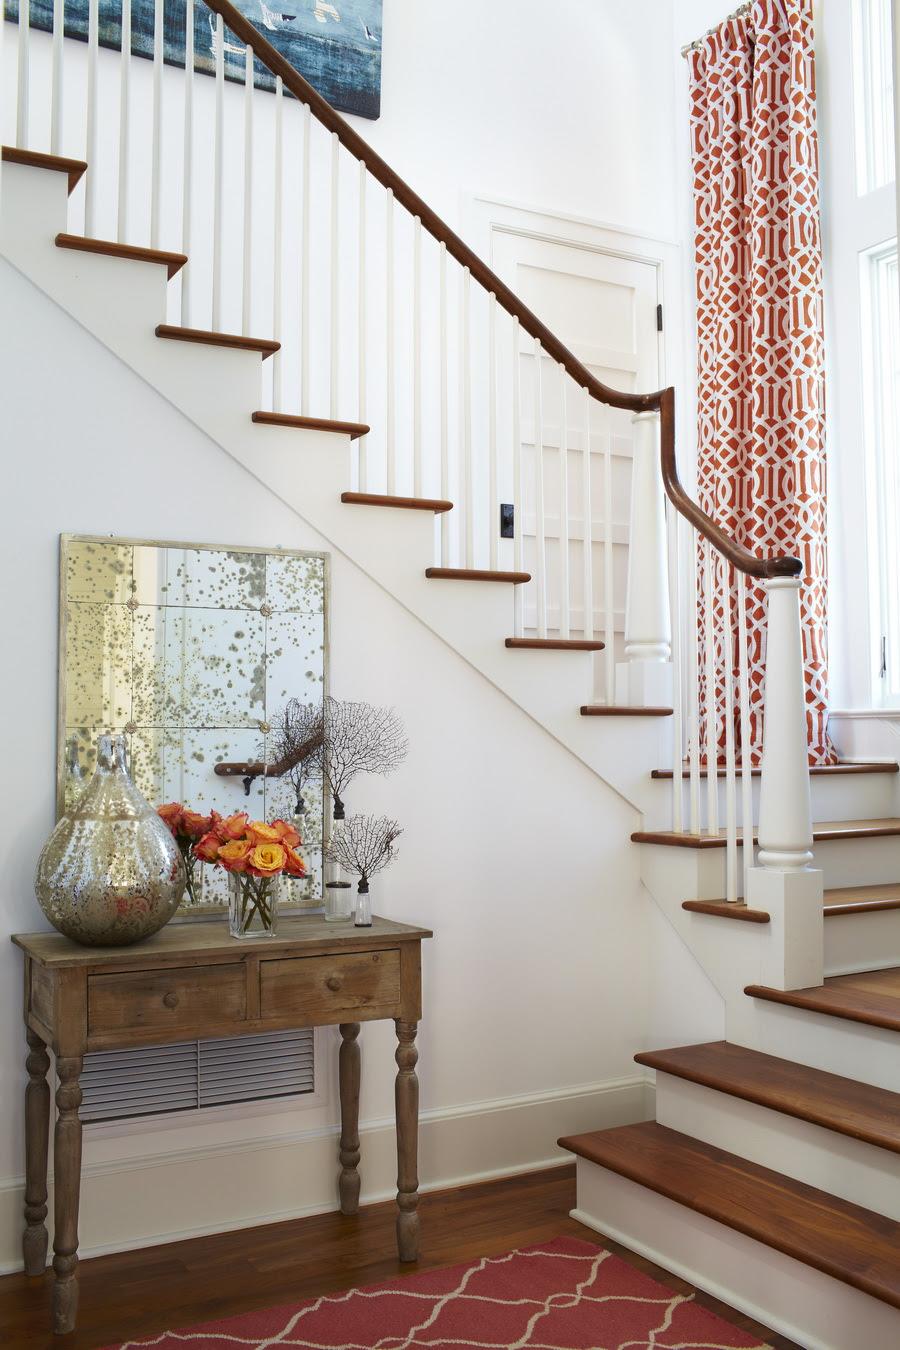 Interiores tracery 10